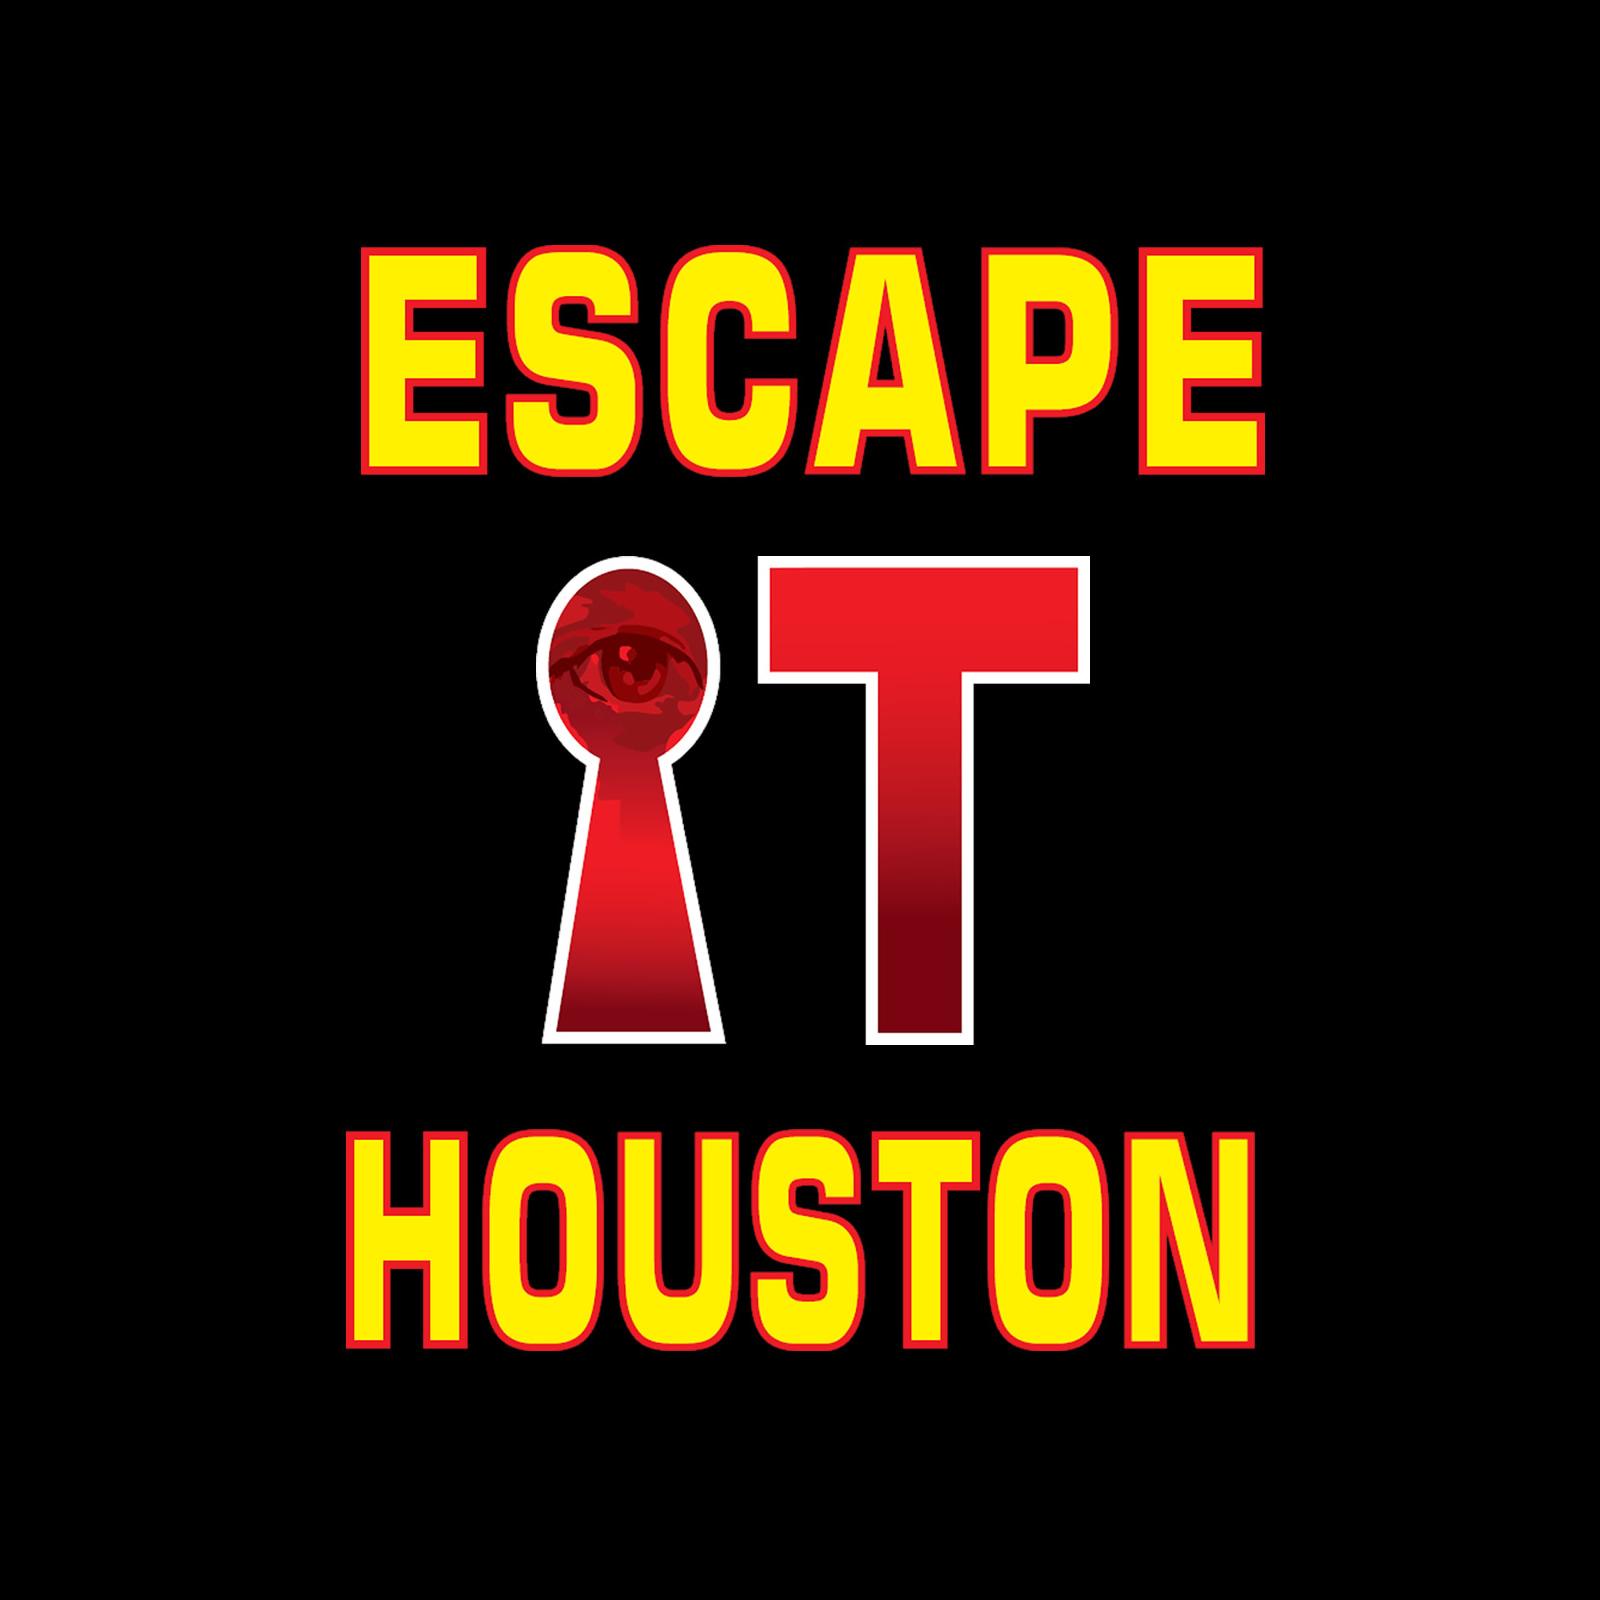 Find It Houston: Phone 281-741-7533